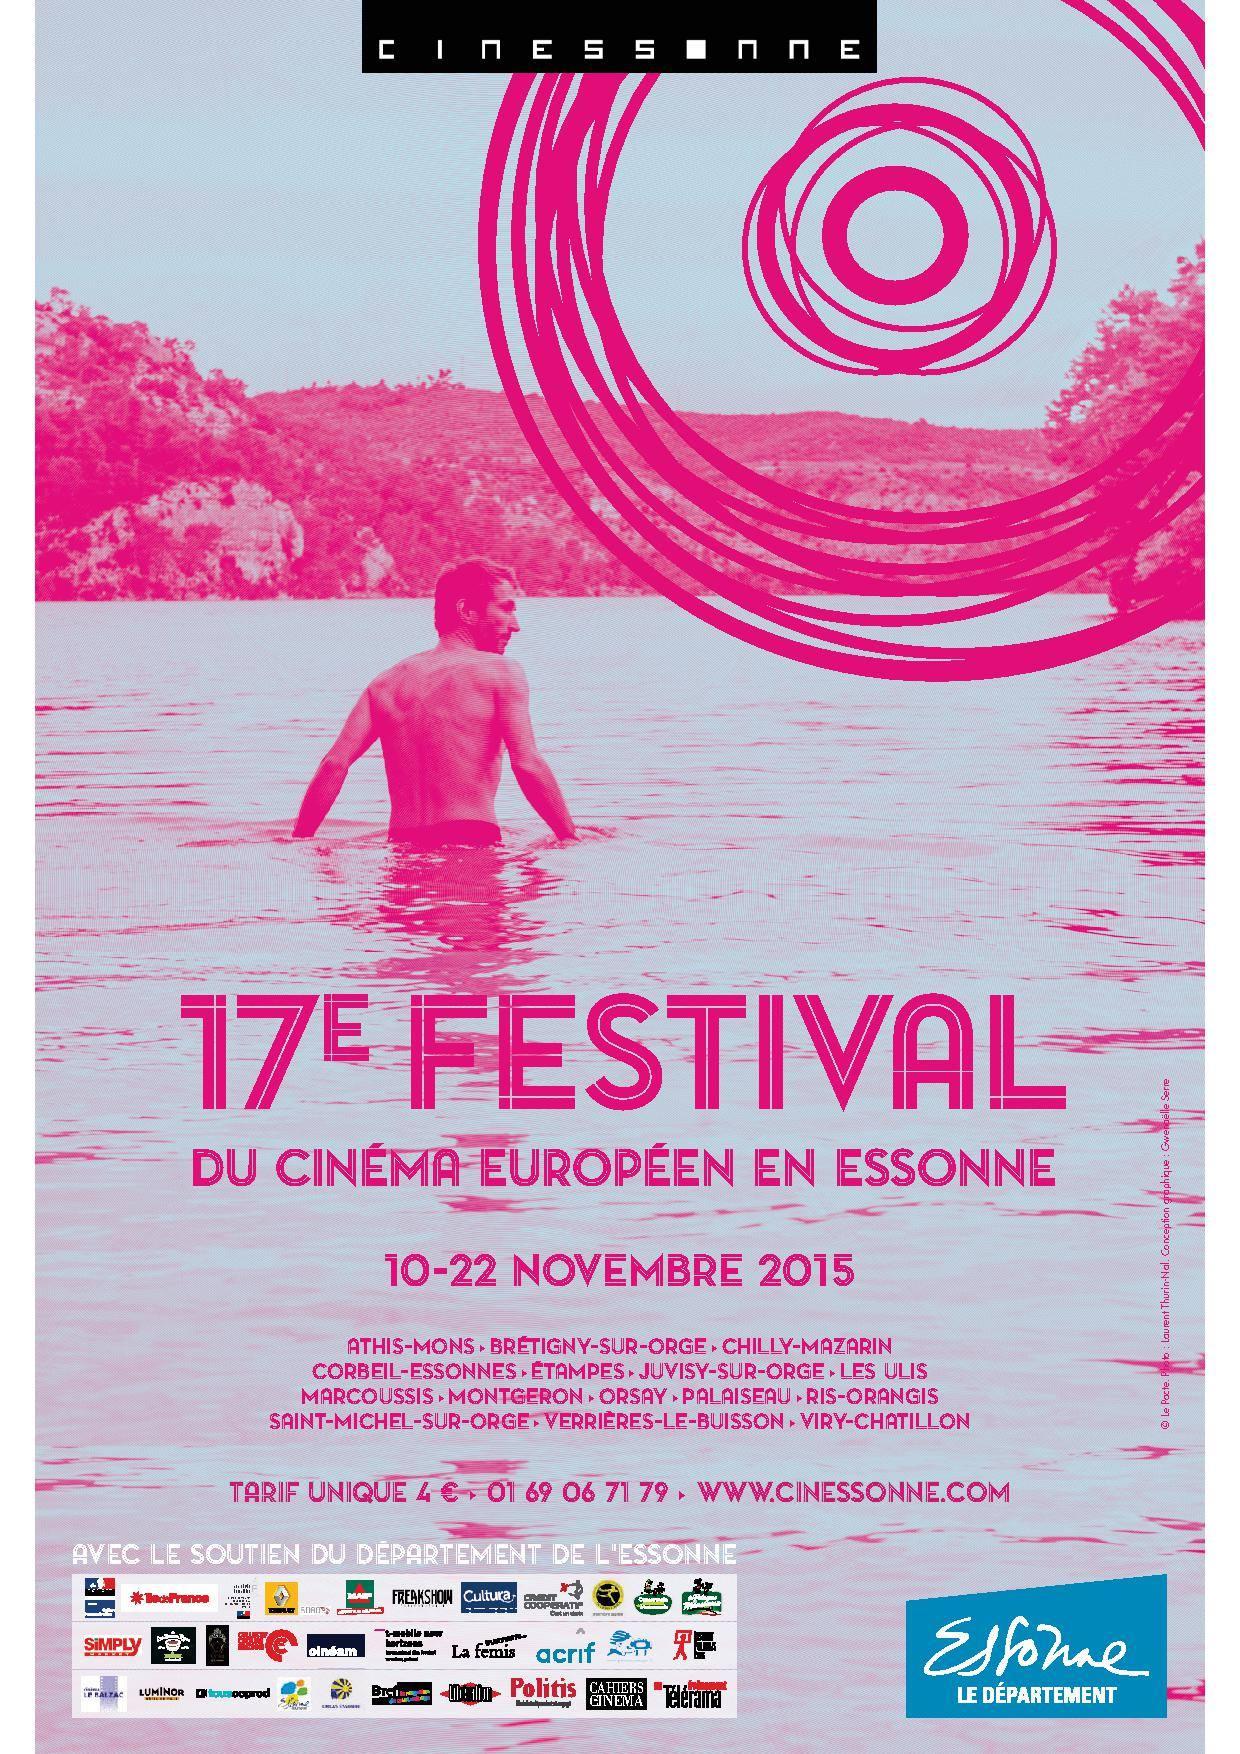 Le Festival du cinema europeen en Essonne